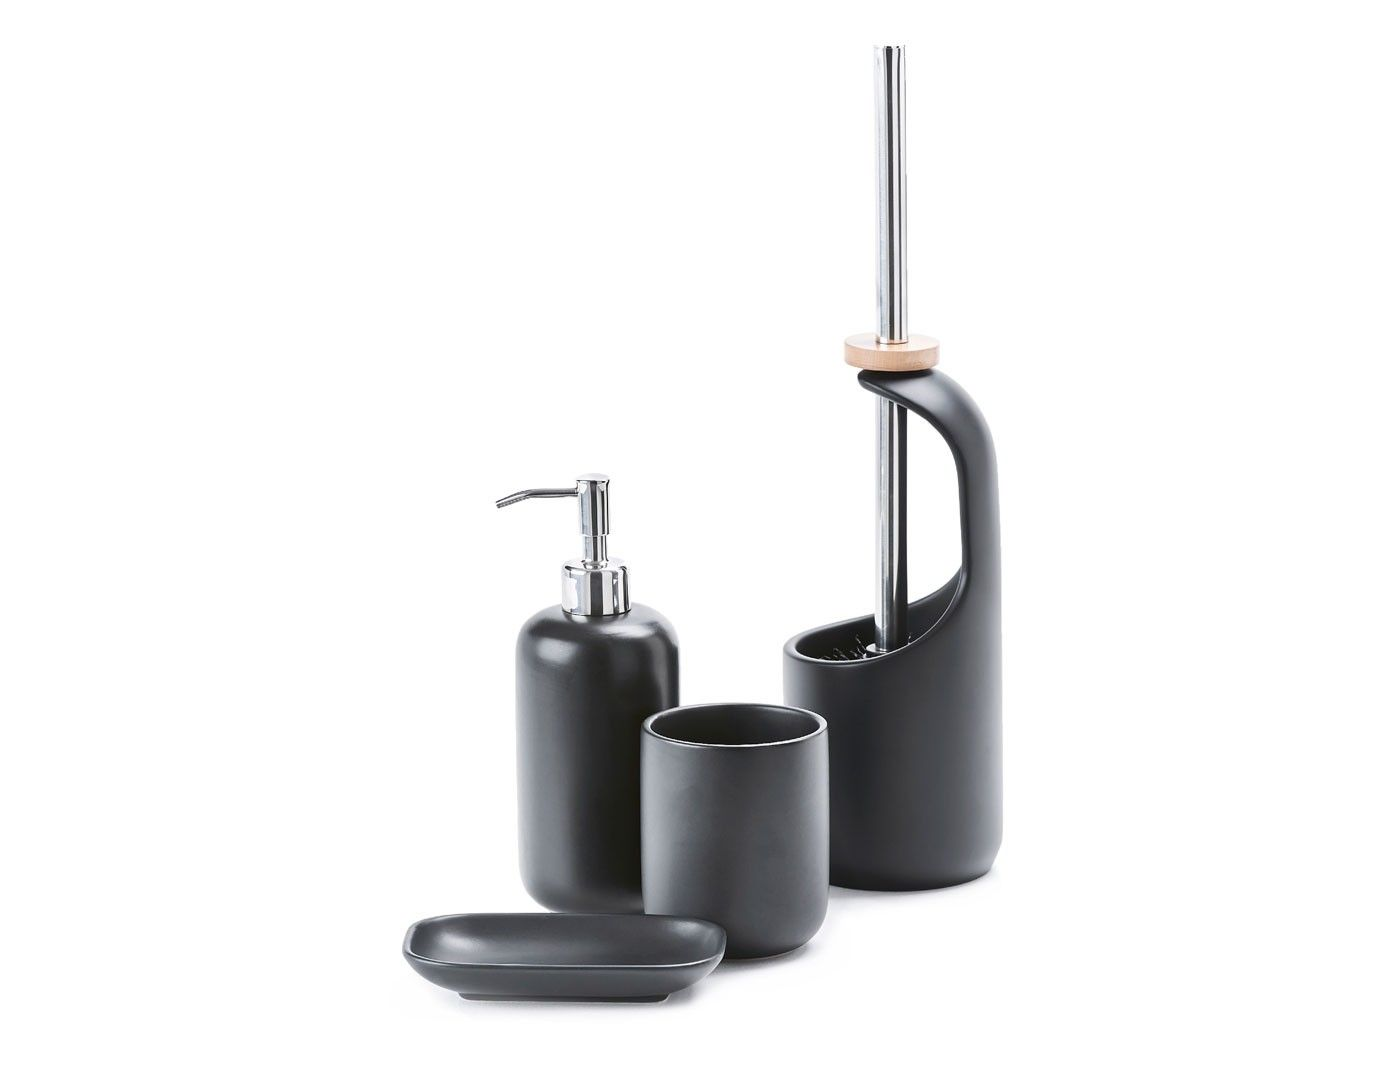 Samson Bathroom Accessories Bathroom Accessories Bathroom